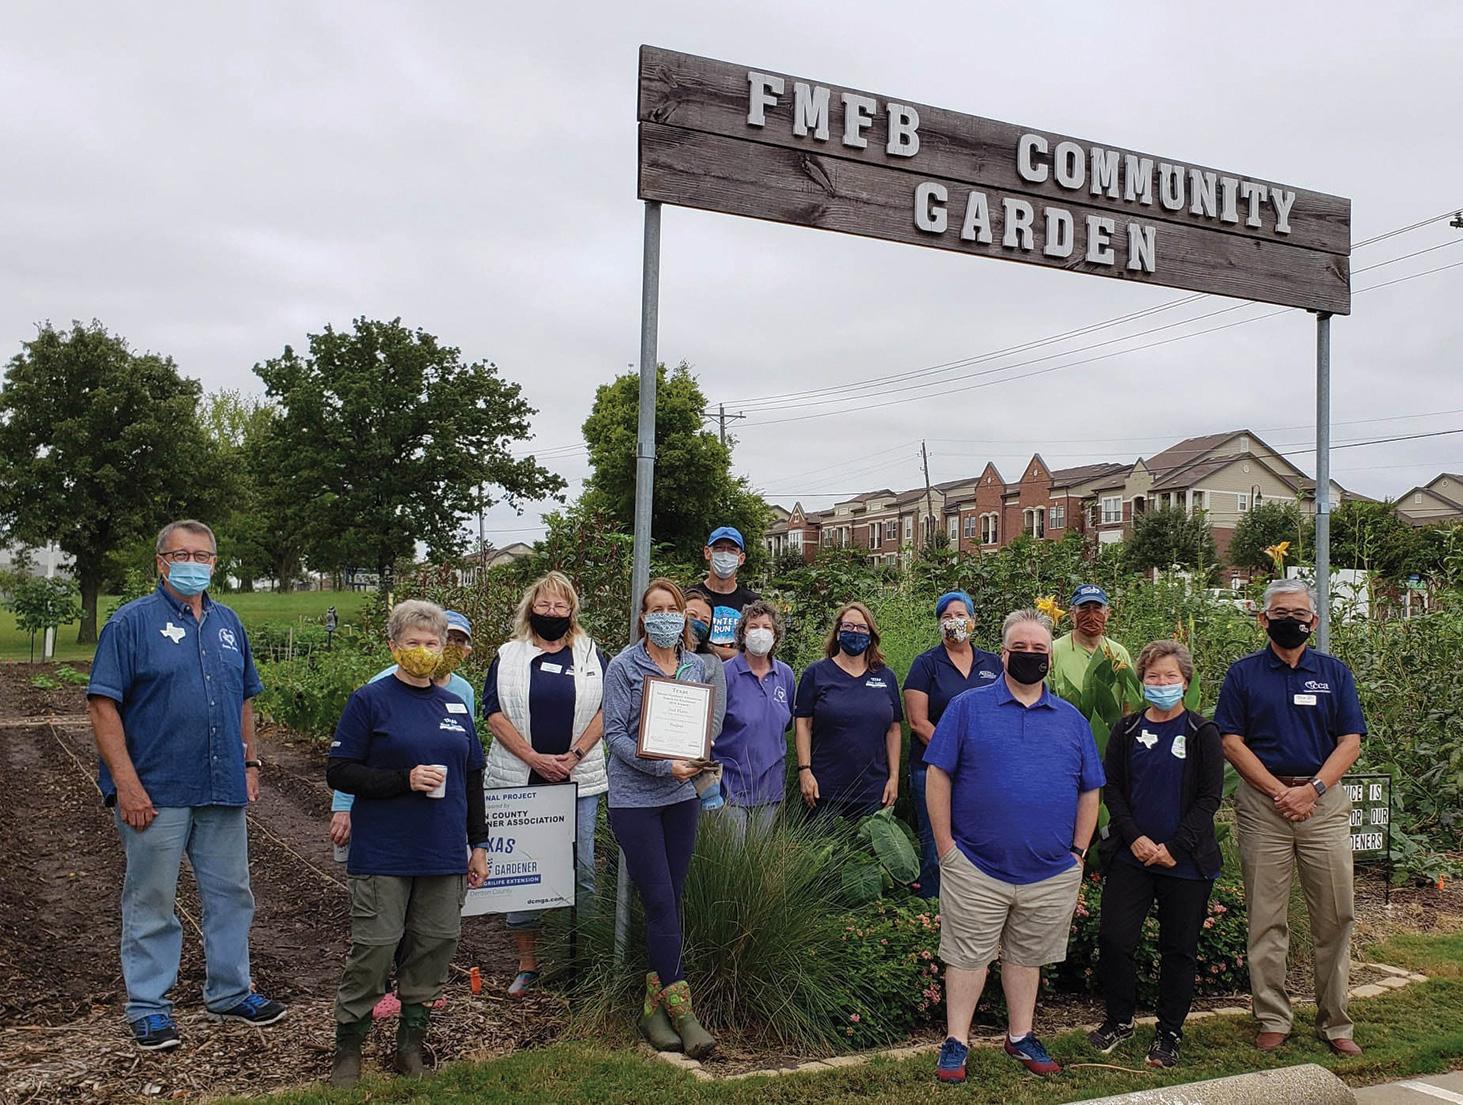 Photo by David Huffman, Denton County Master Gardener Association